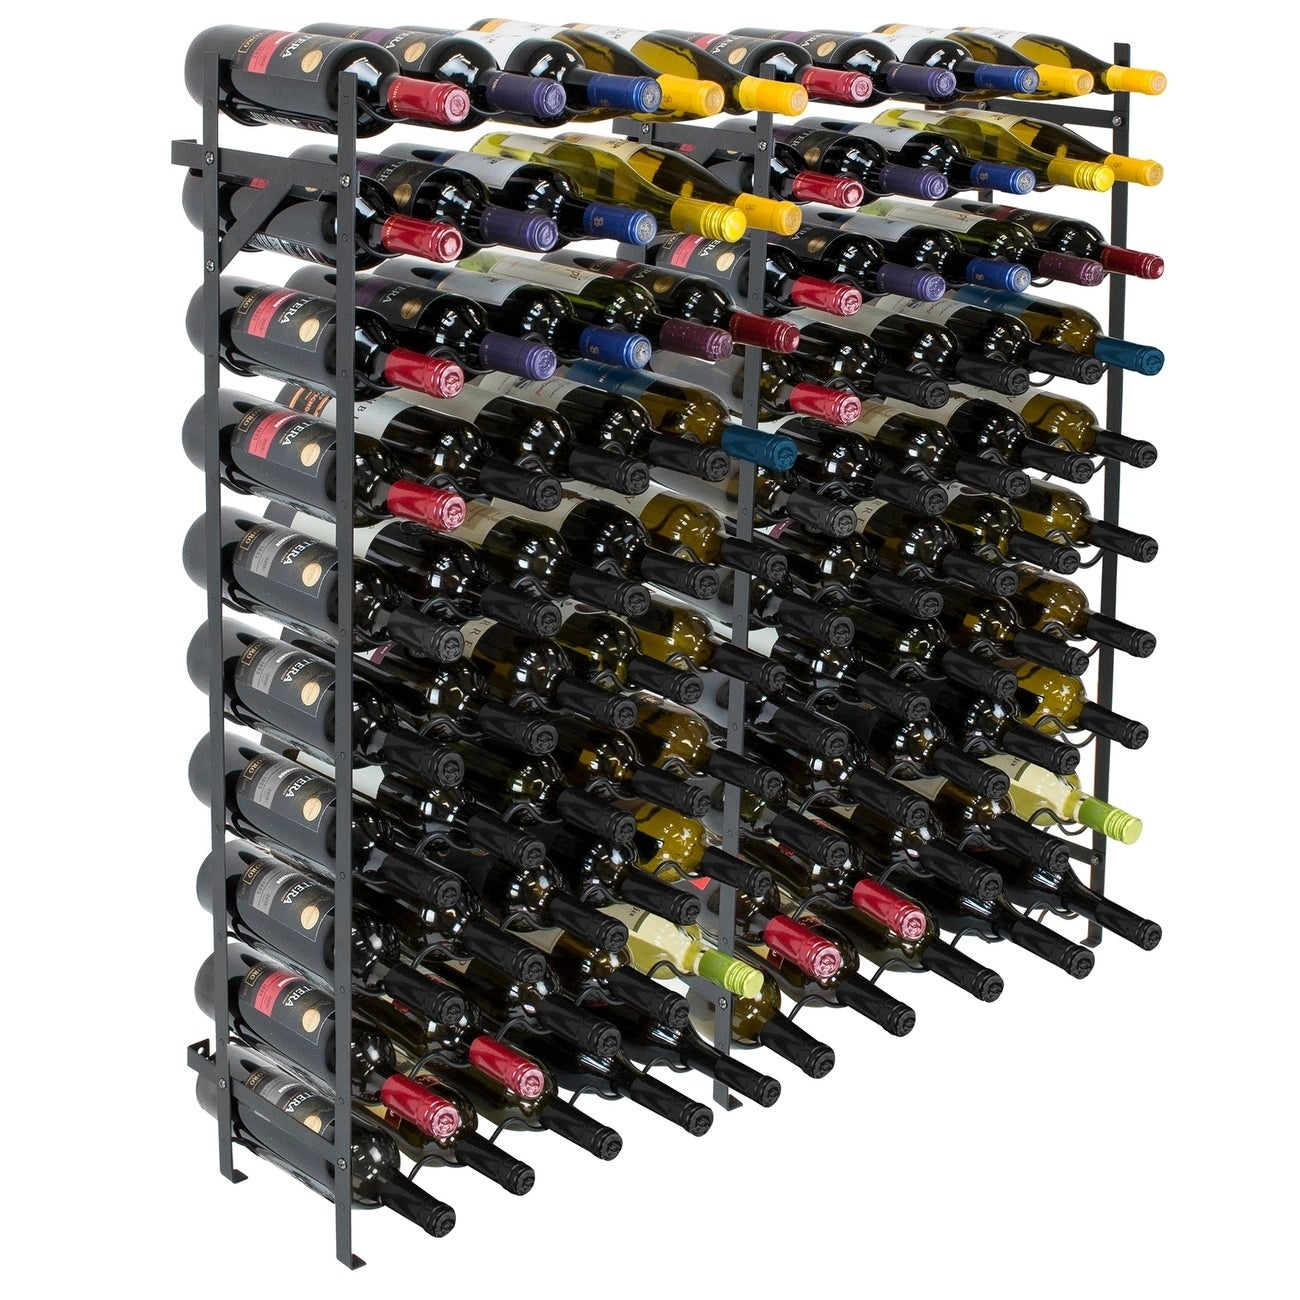 Hand Made Wooden Wine Rack /& Glass Holder Cabinet Natural Wood Display Storage 5 Bottles Capacity